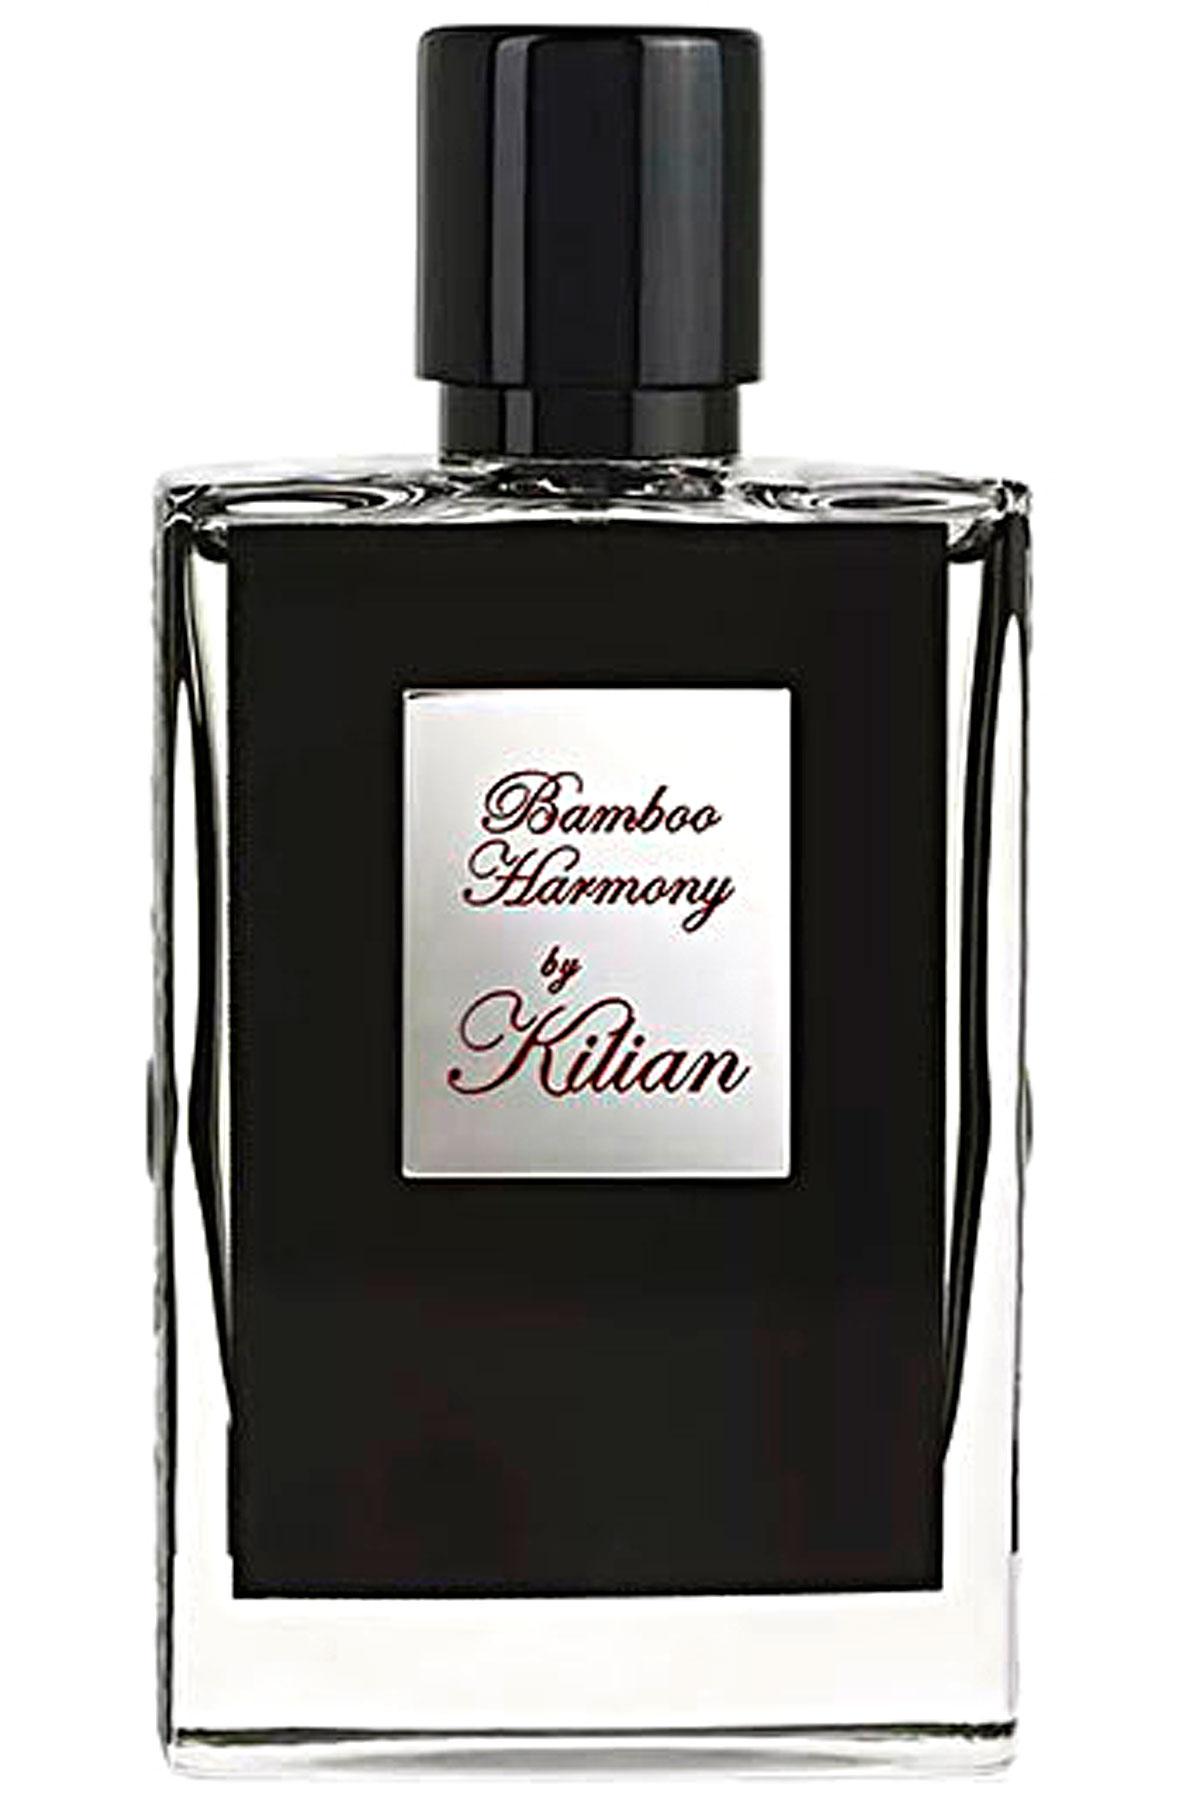 Kilian Fragrances for Men, Bamboo Harmony - Eau De Parfum - 50 Ml, 2019, 50 ml